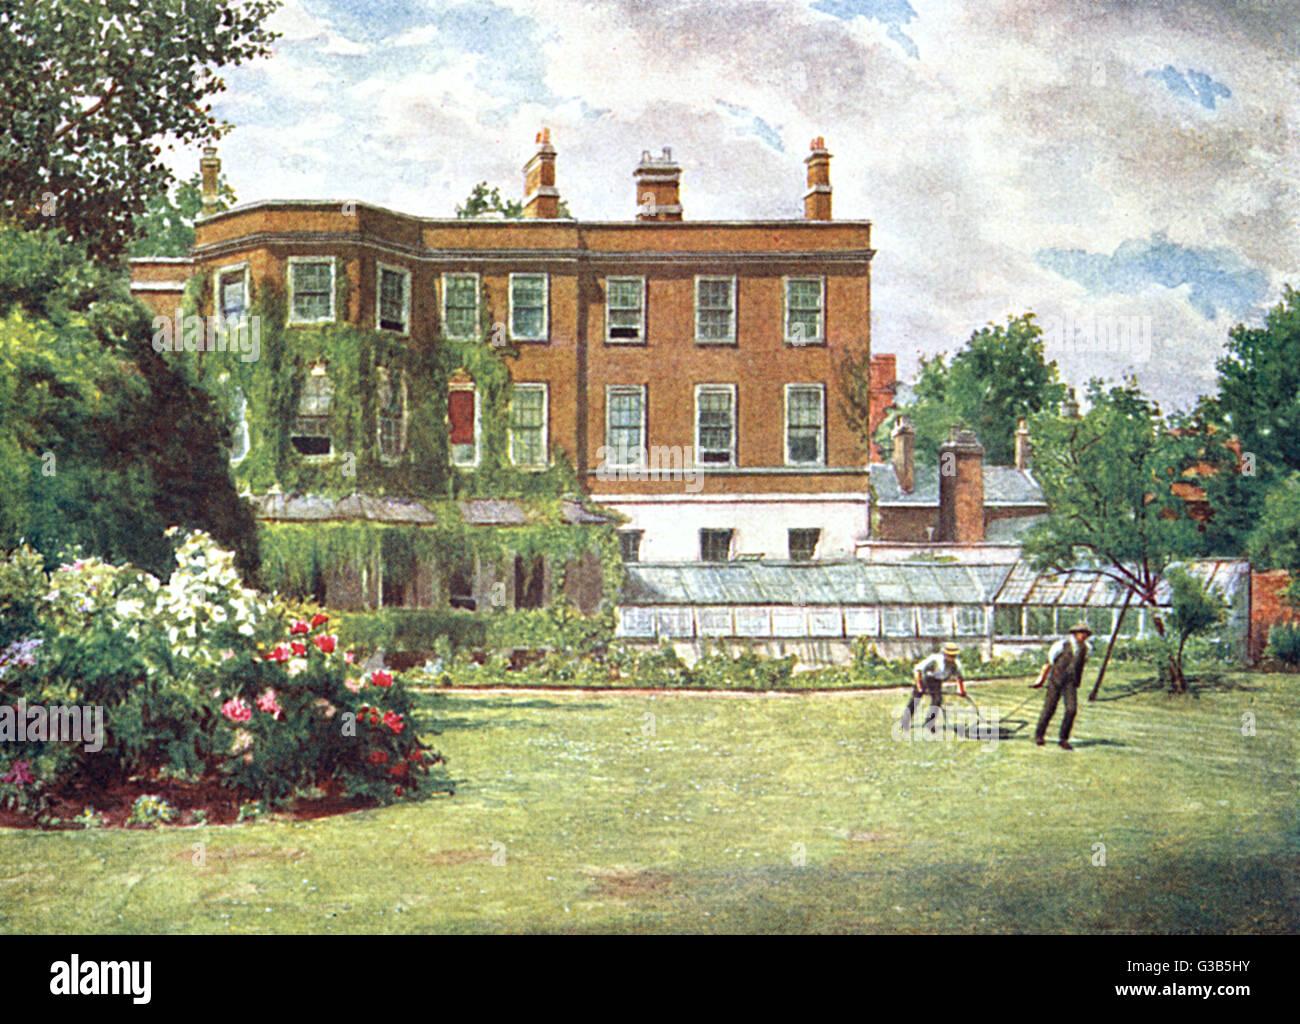 York House, Church Street,  Kensington, demolished in 1904        Date: 1899 - Stock Image